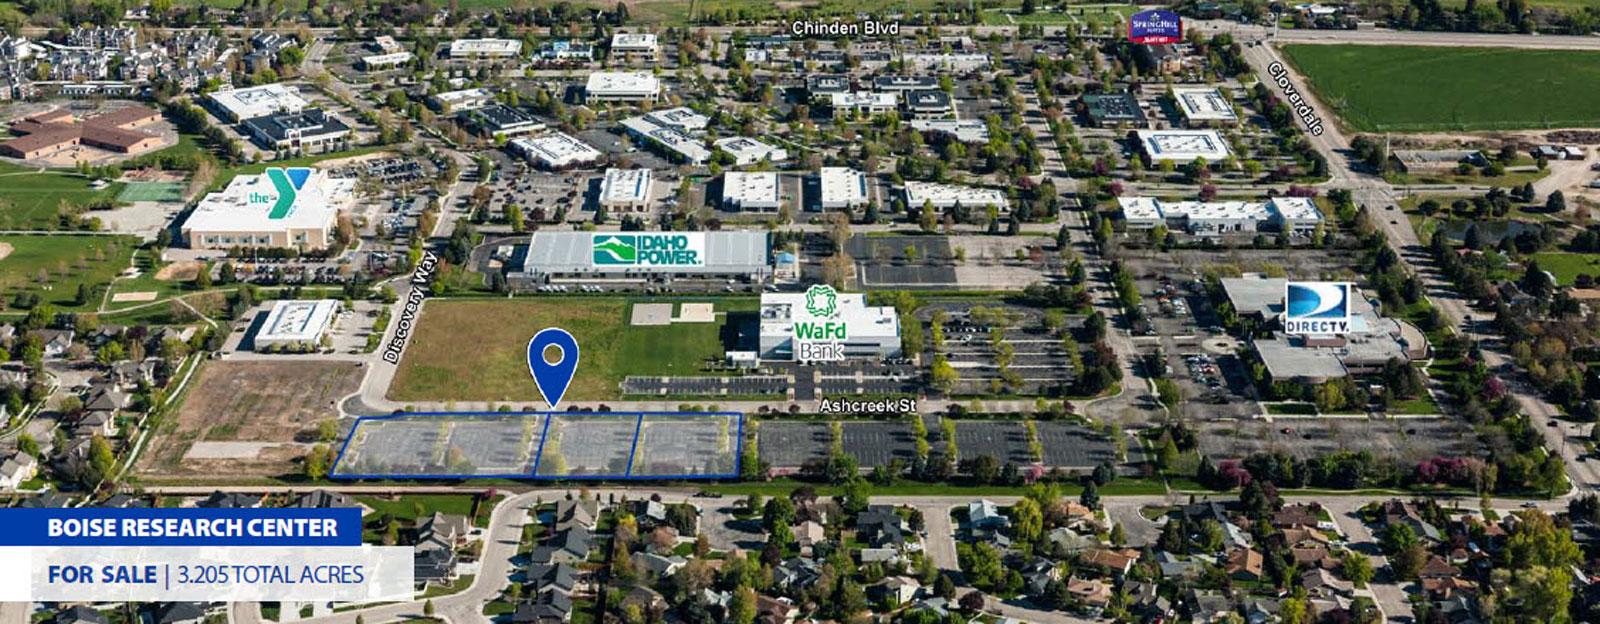 Boise Research Center Lots - Main Photo